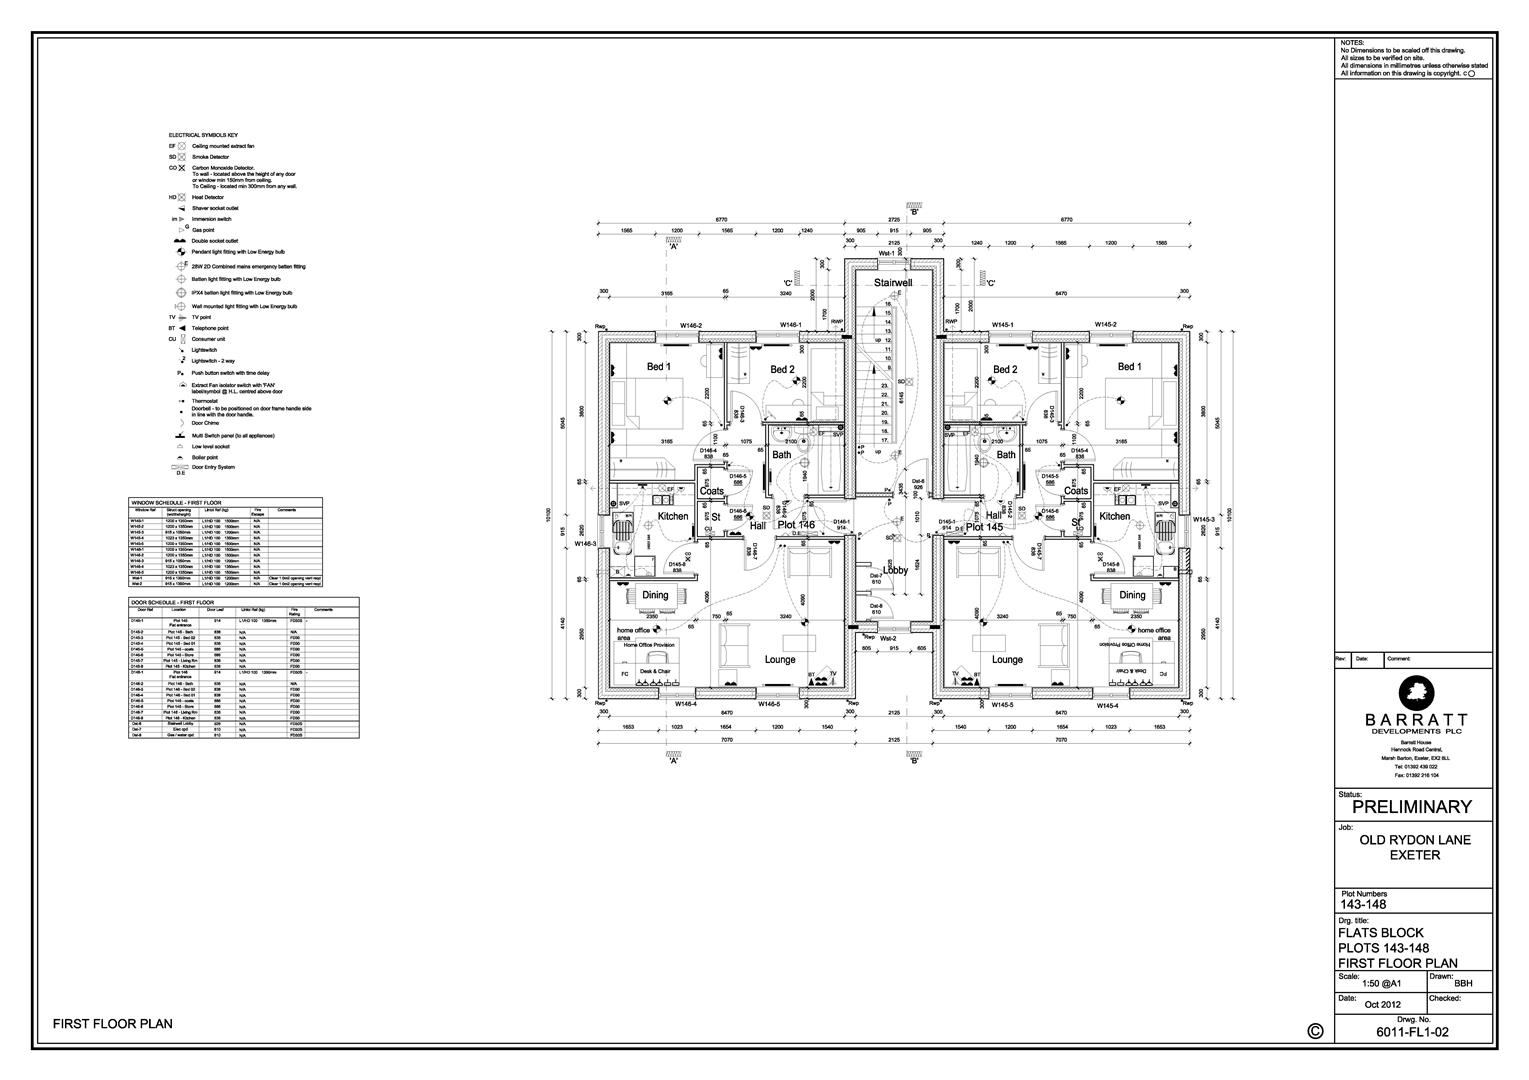 Old Rydon Lane_Plots 143-148 Flats_First Floor Pla